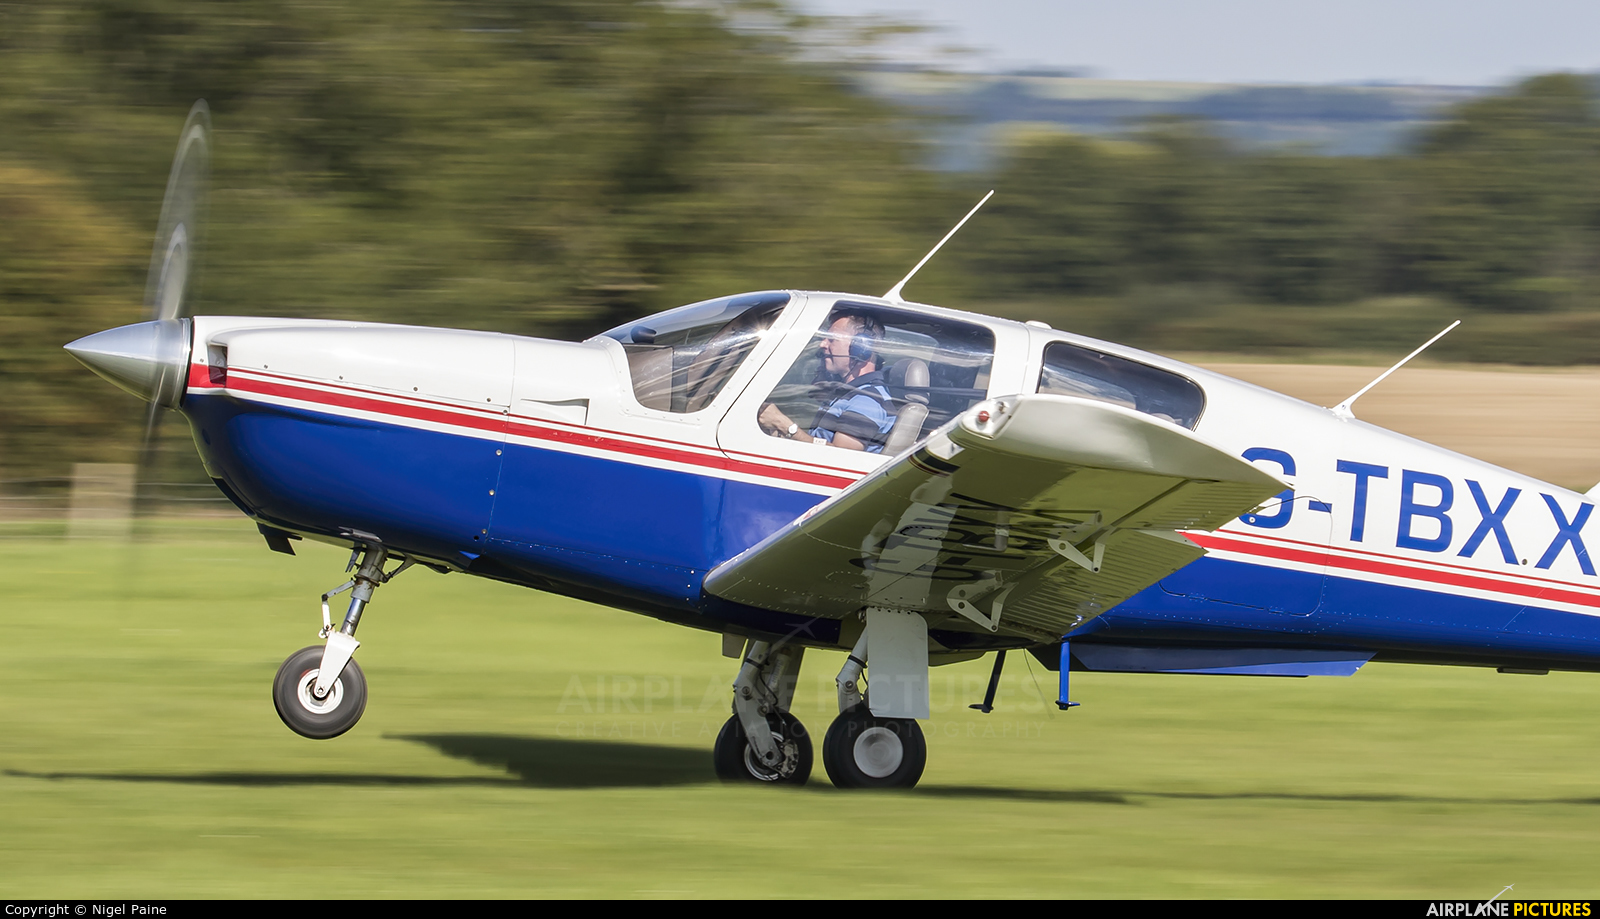 Private G-TBXX aircraft at Lashenden / Headcorn